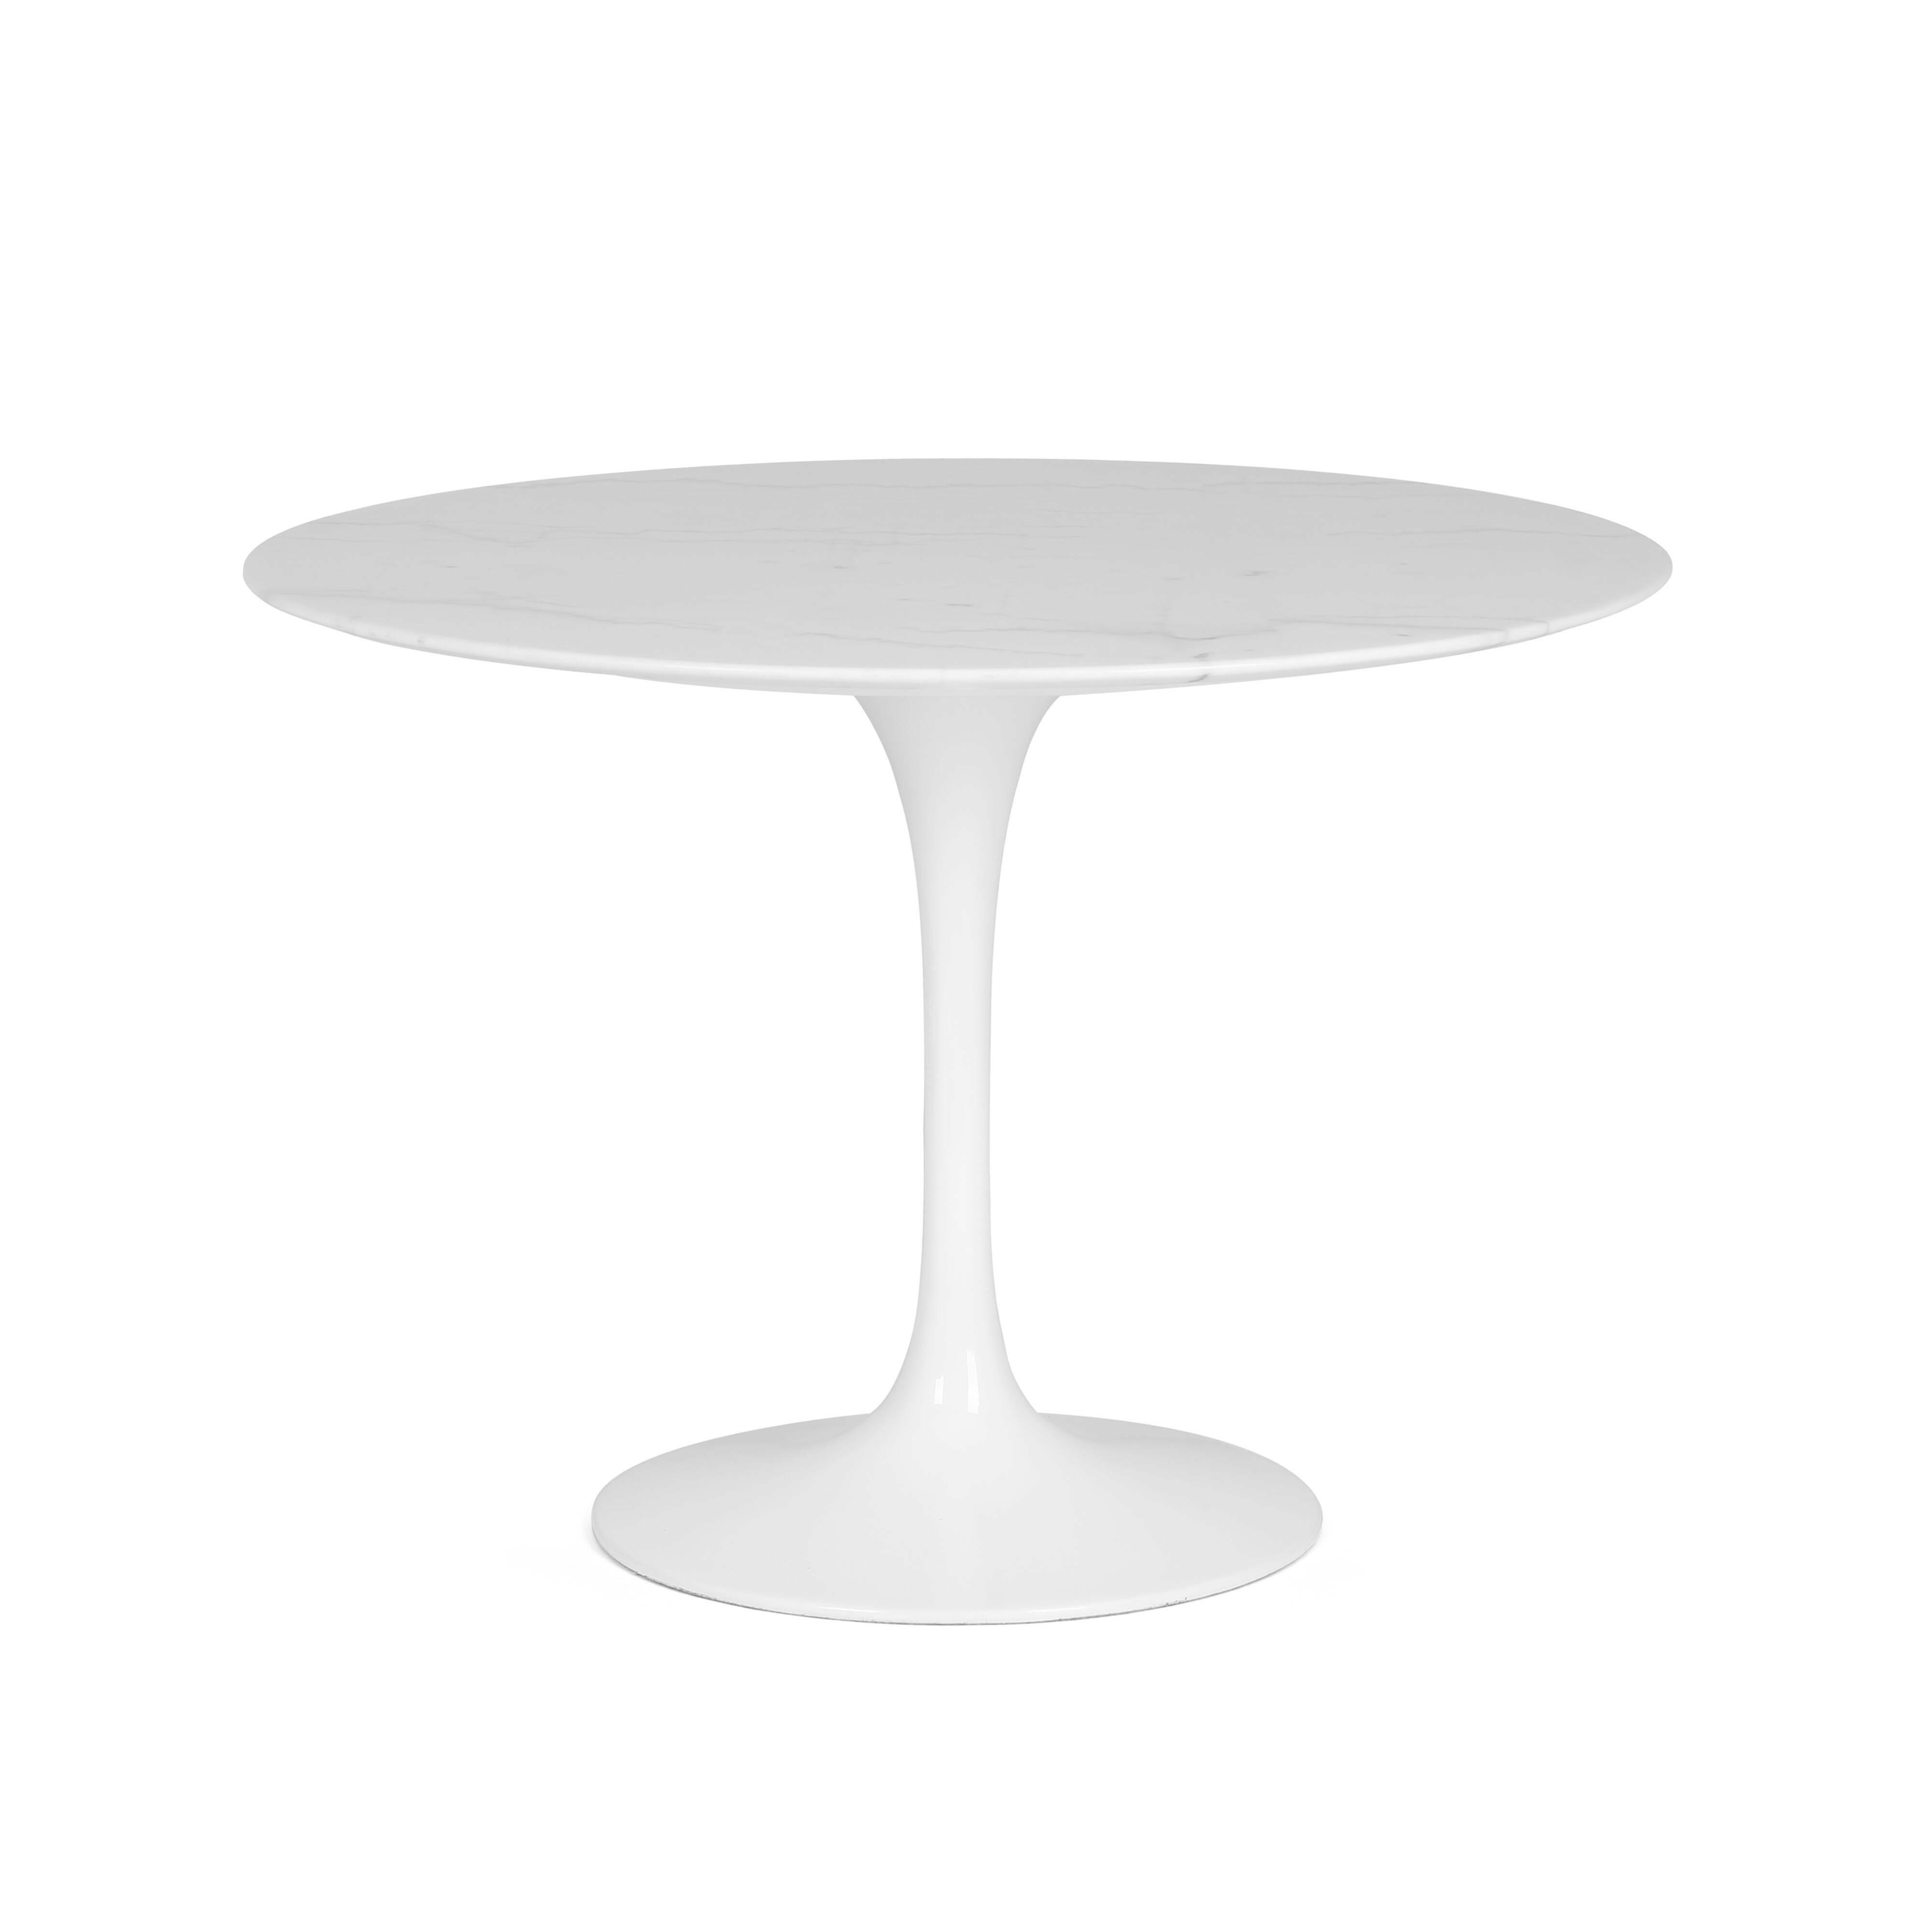 Стол обеденный круглый DT6131C new